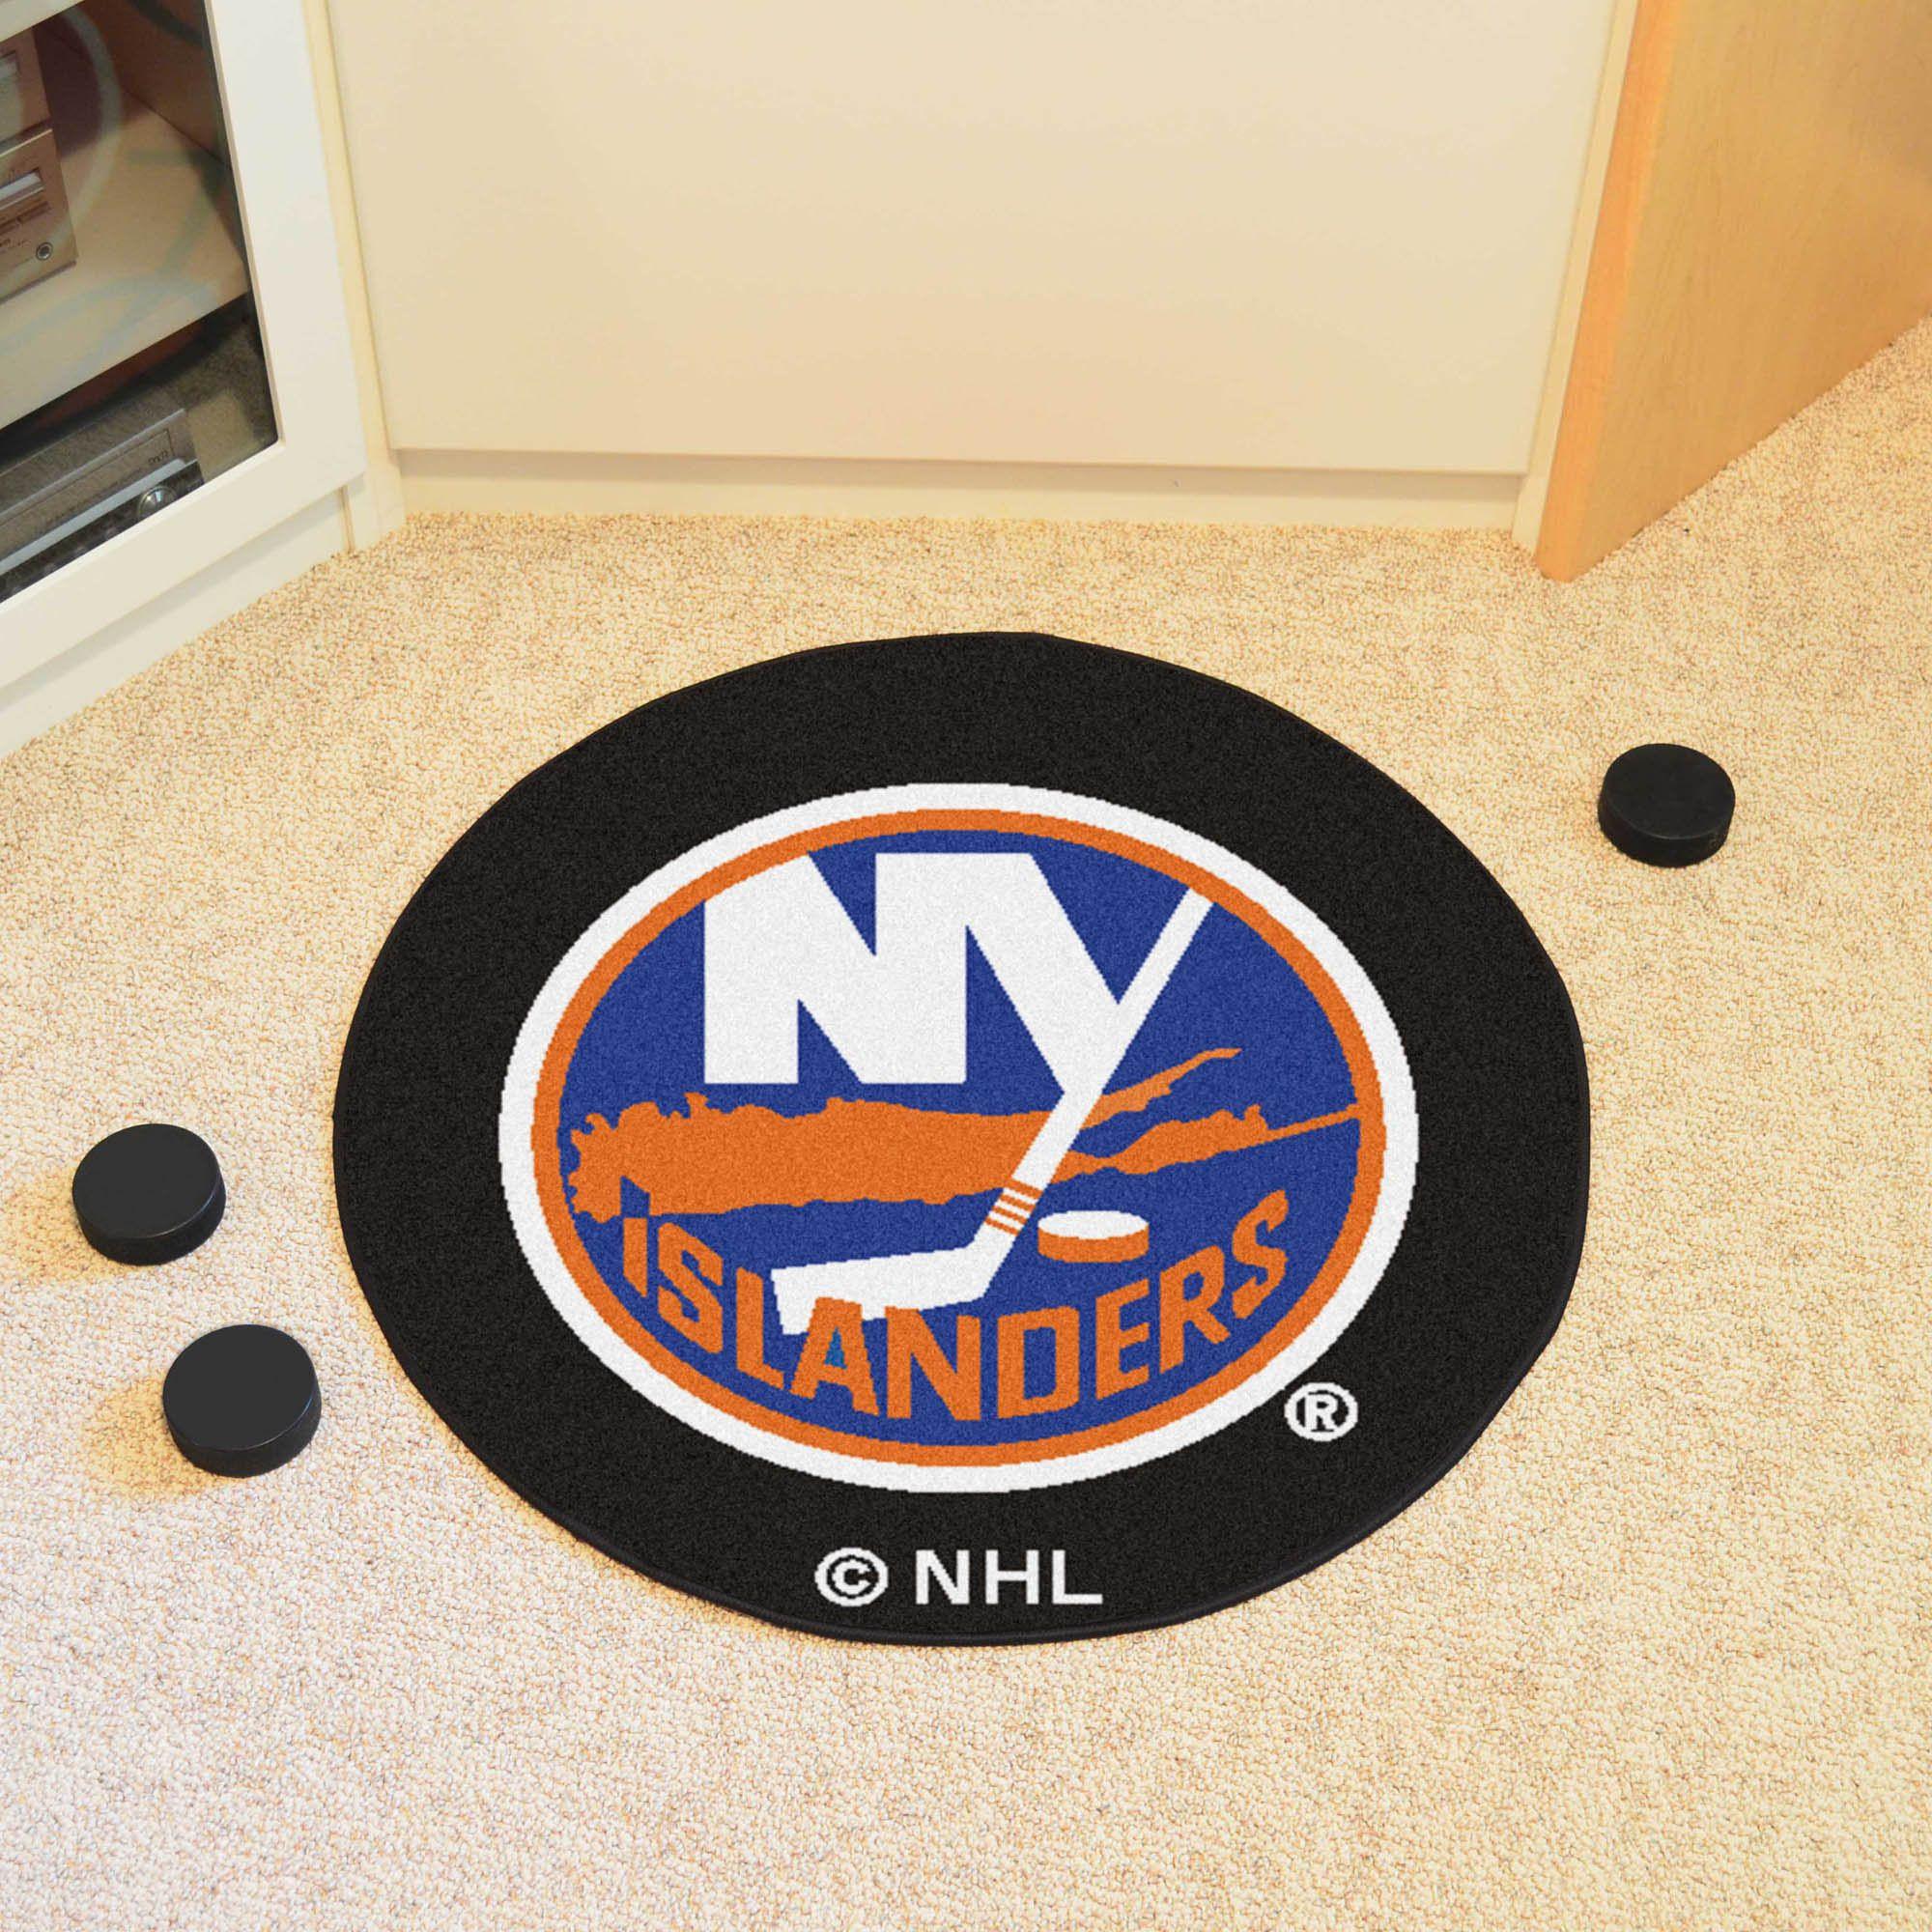 New York Islanders Puck Mat New york islanders, Nhl news